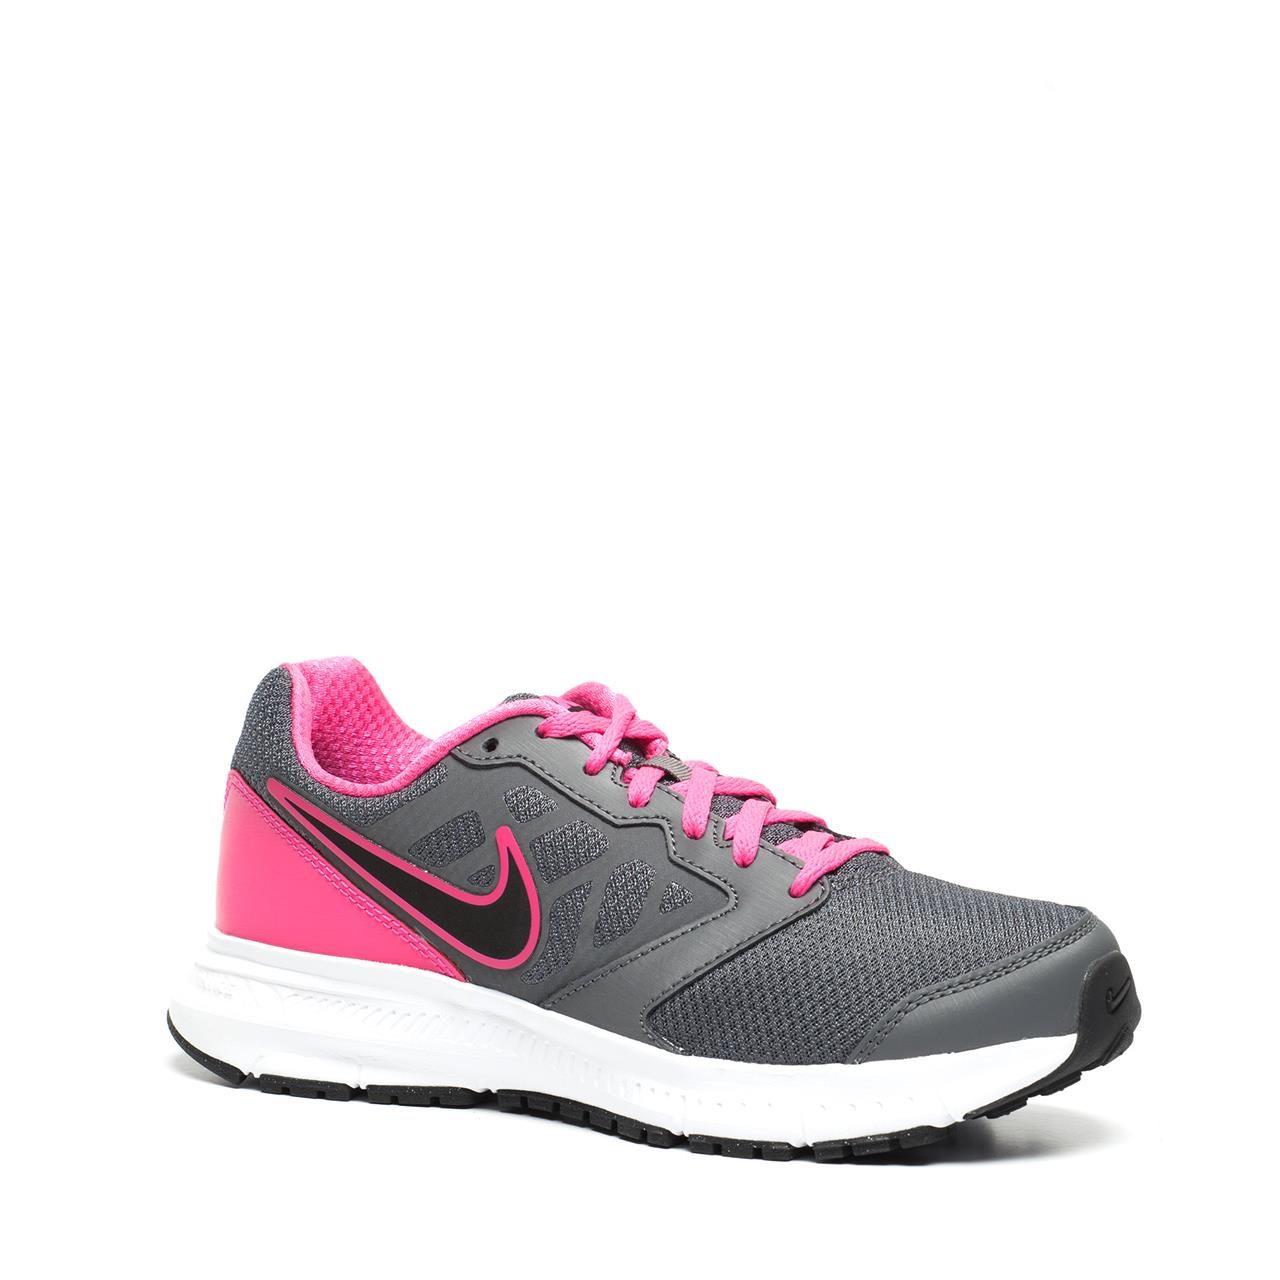 Nike Downshifter 6 dames hardloopschoenen Running